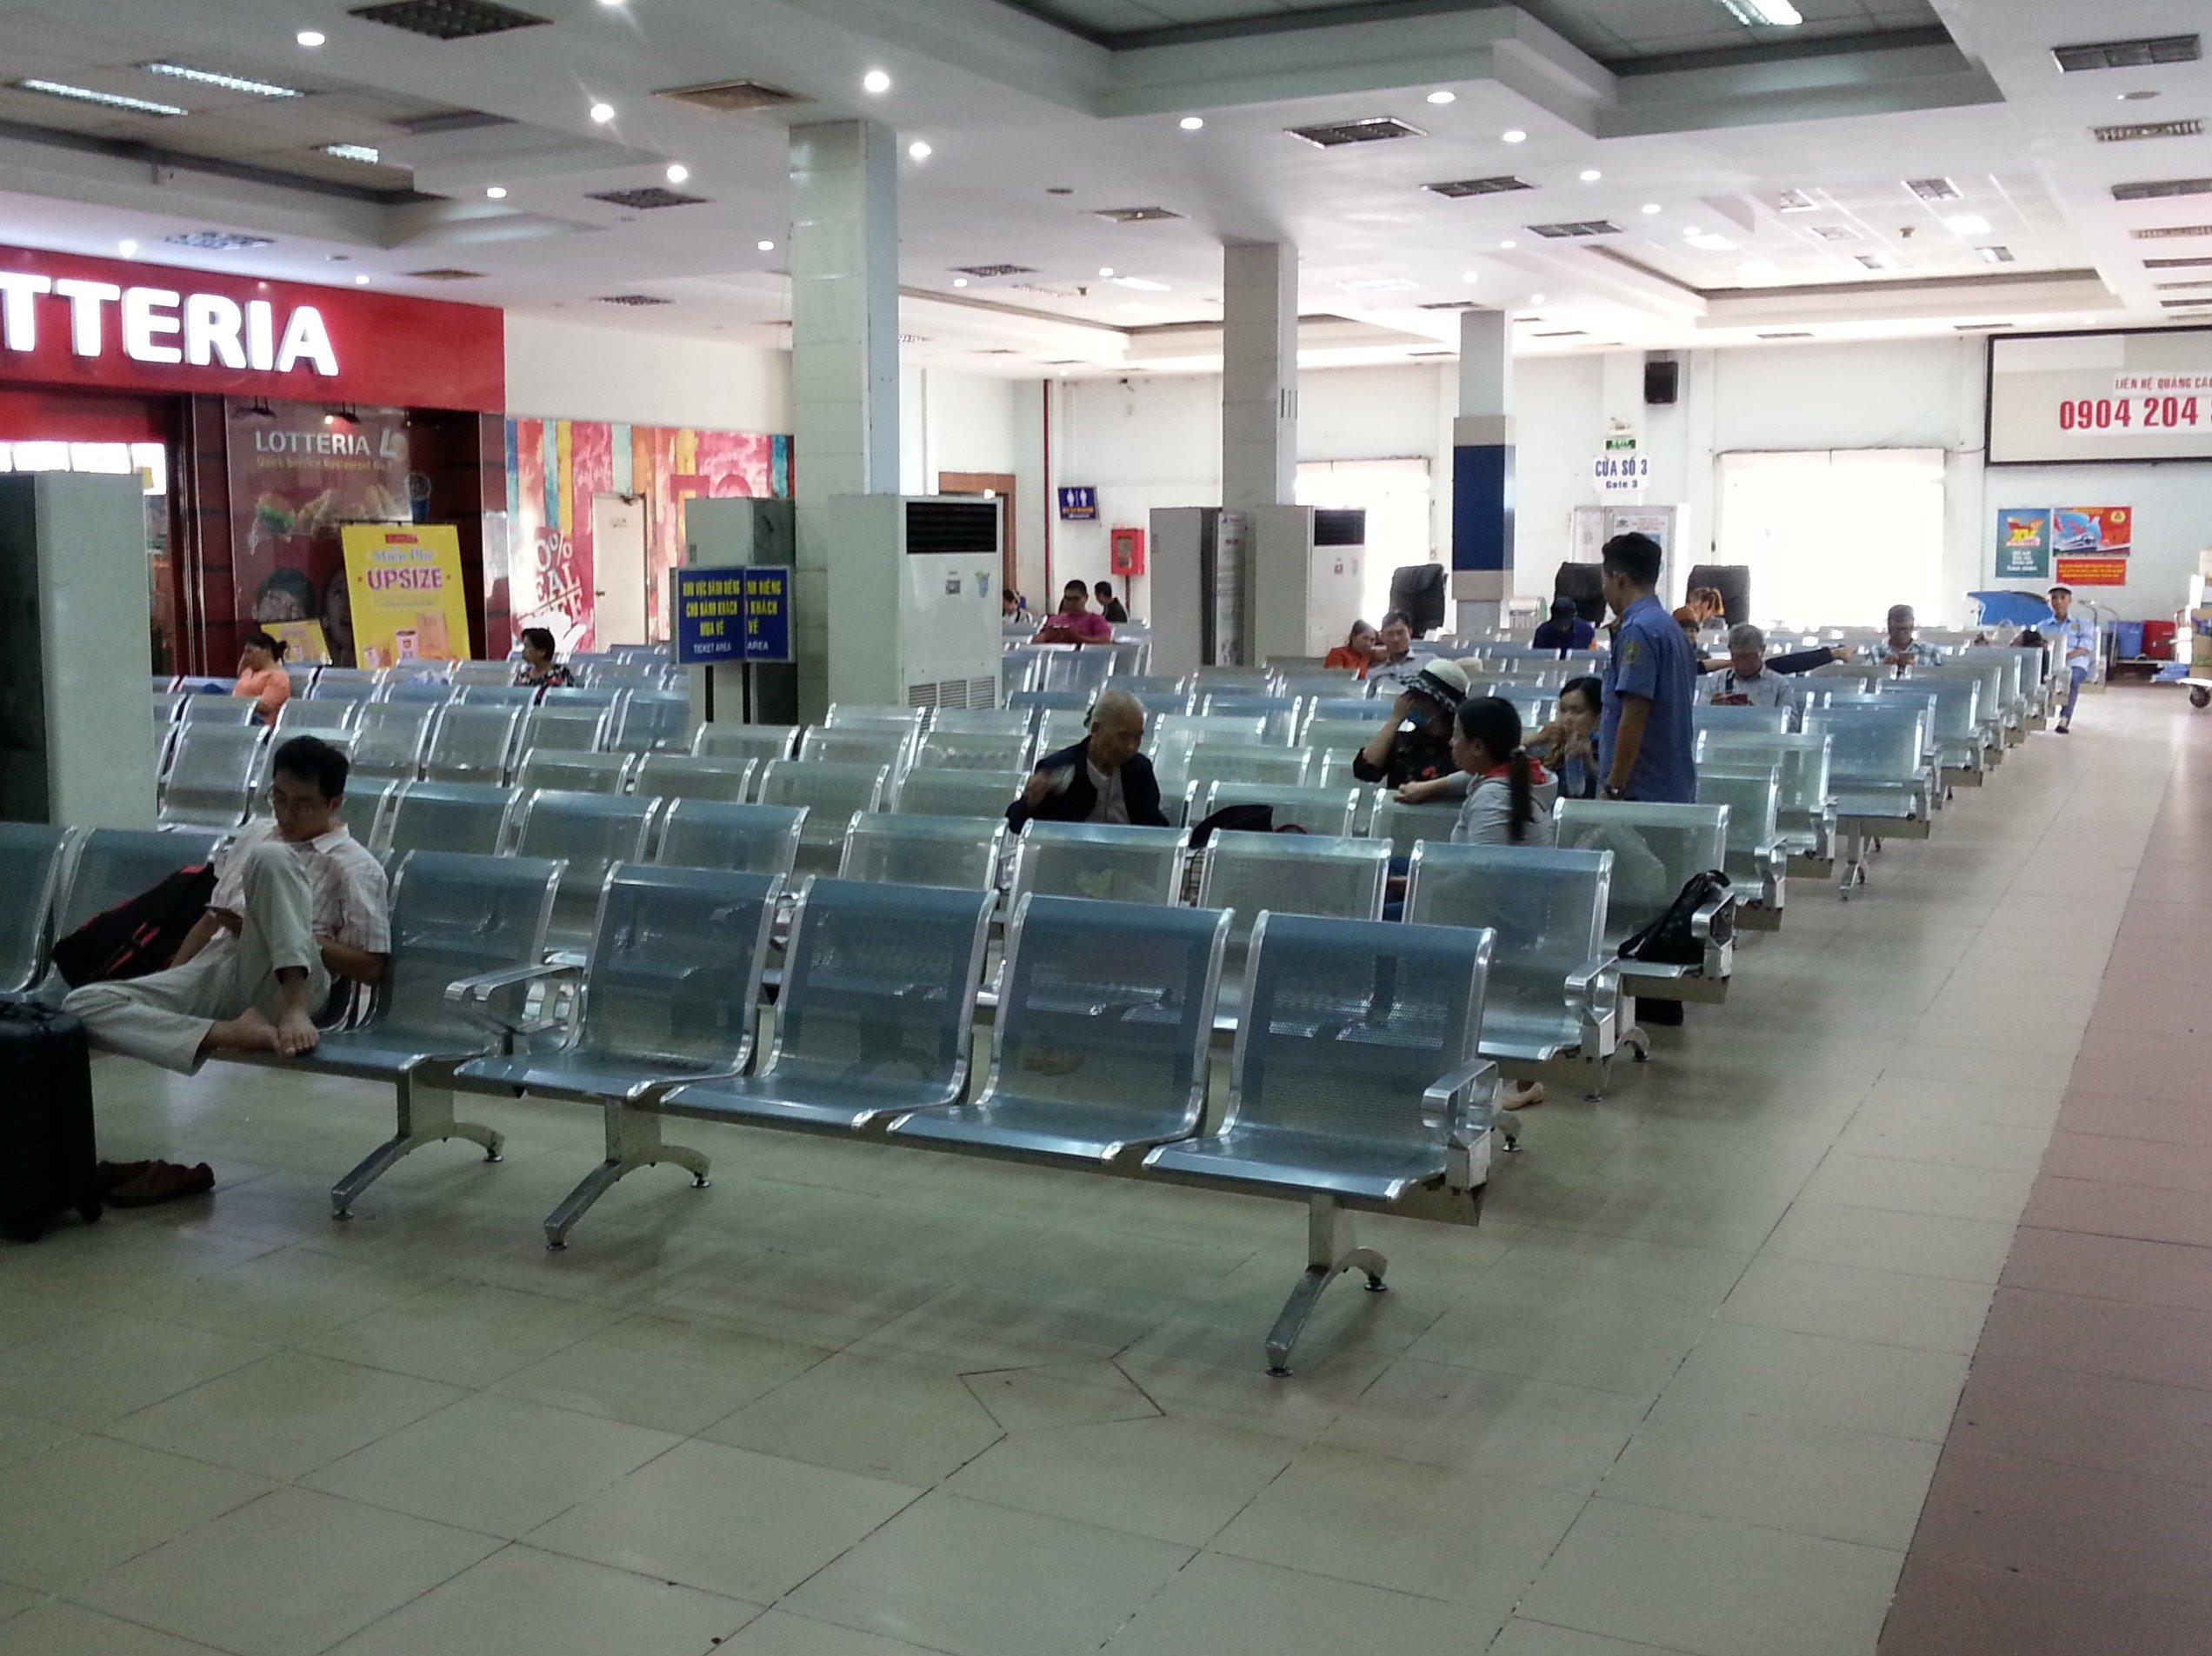 Waiting area at Saigon Railway Station